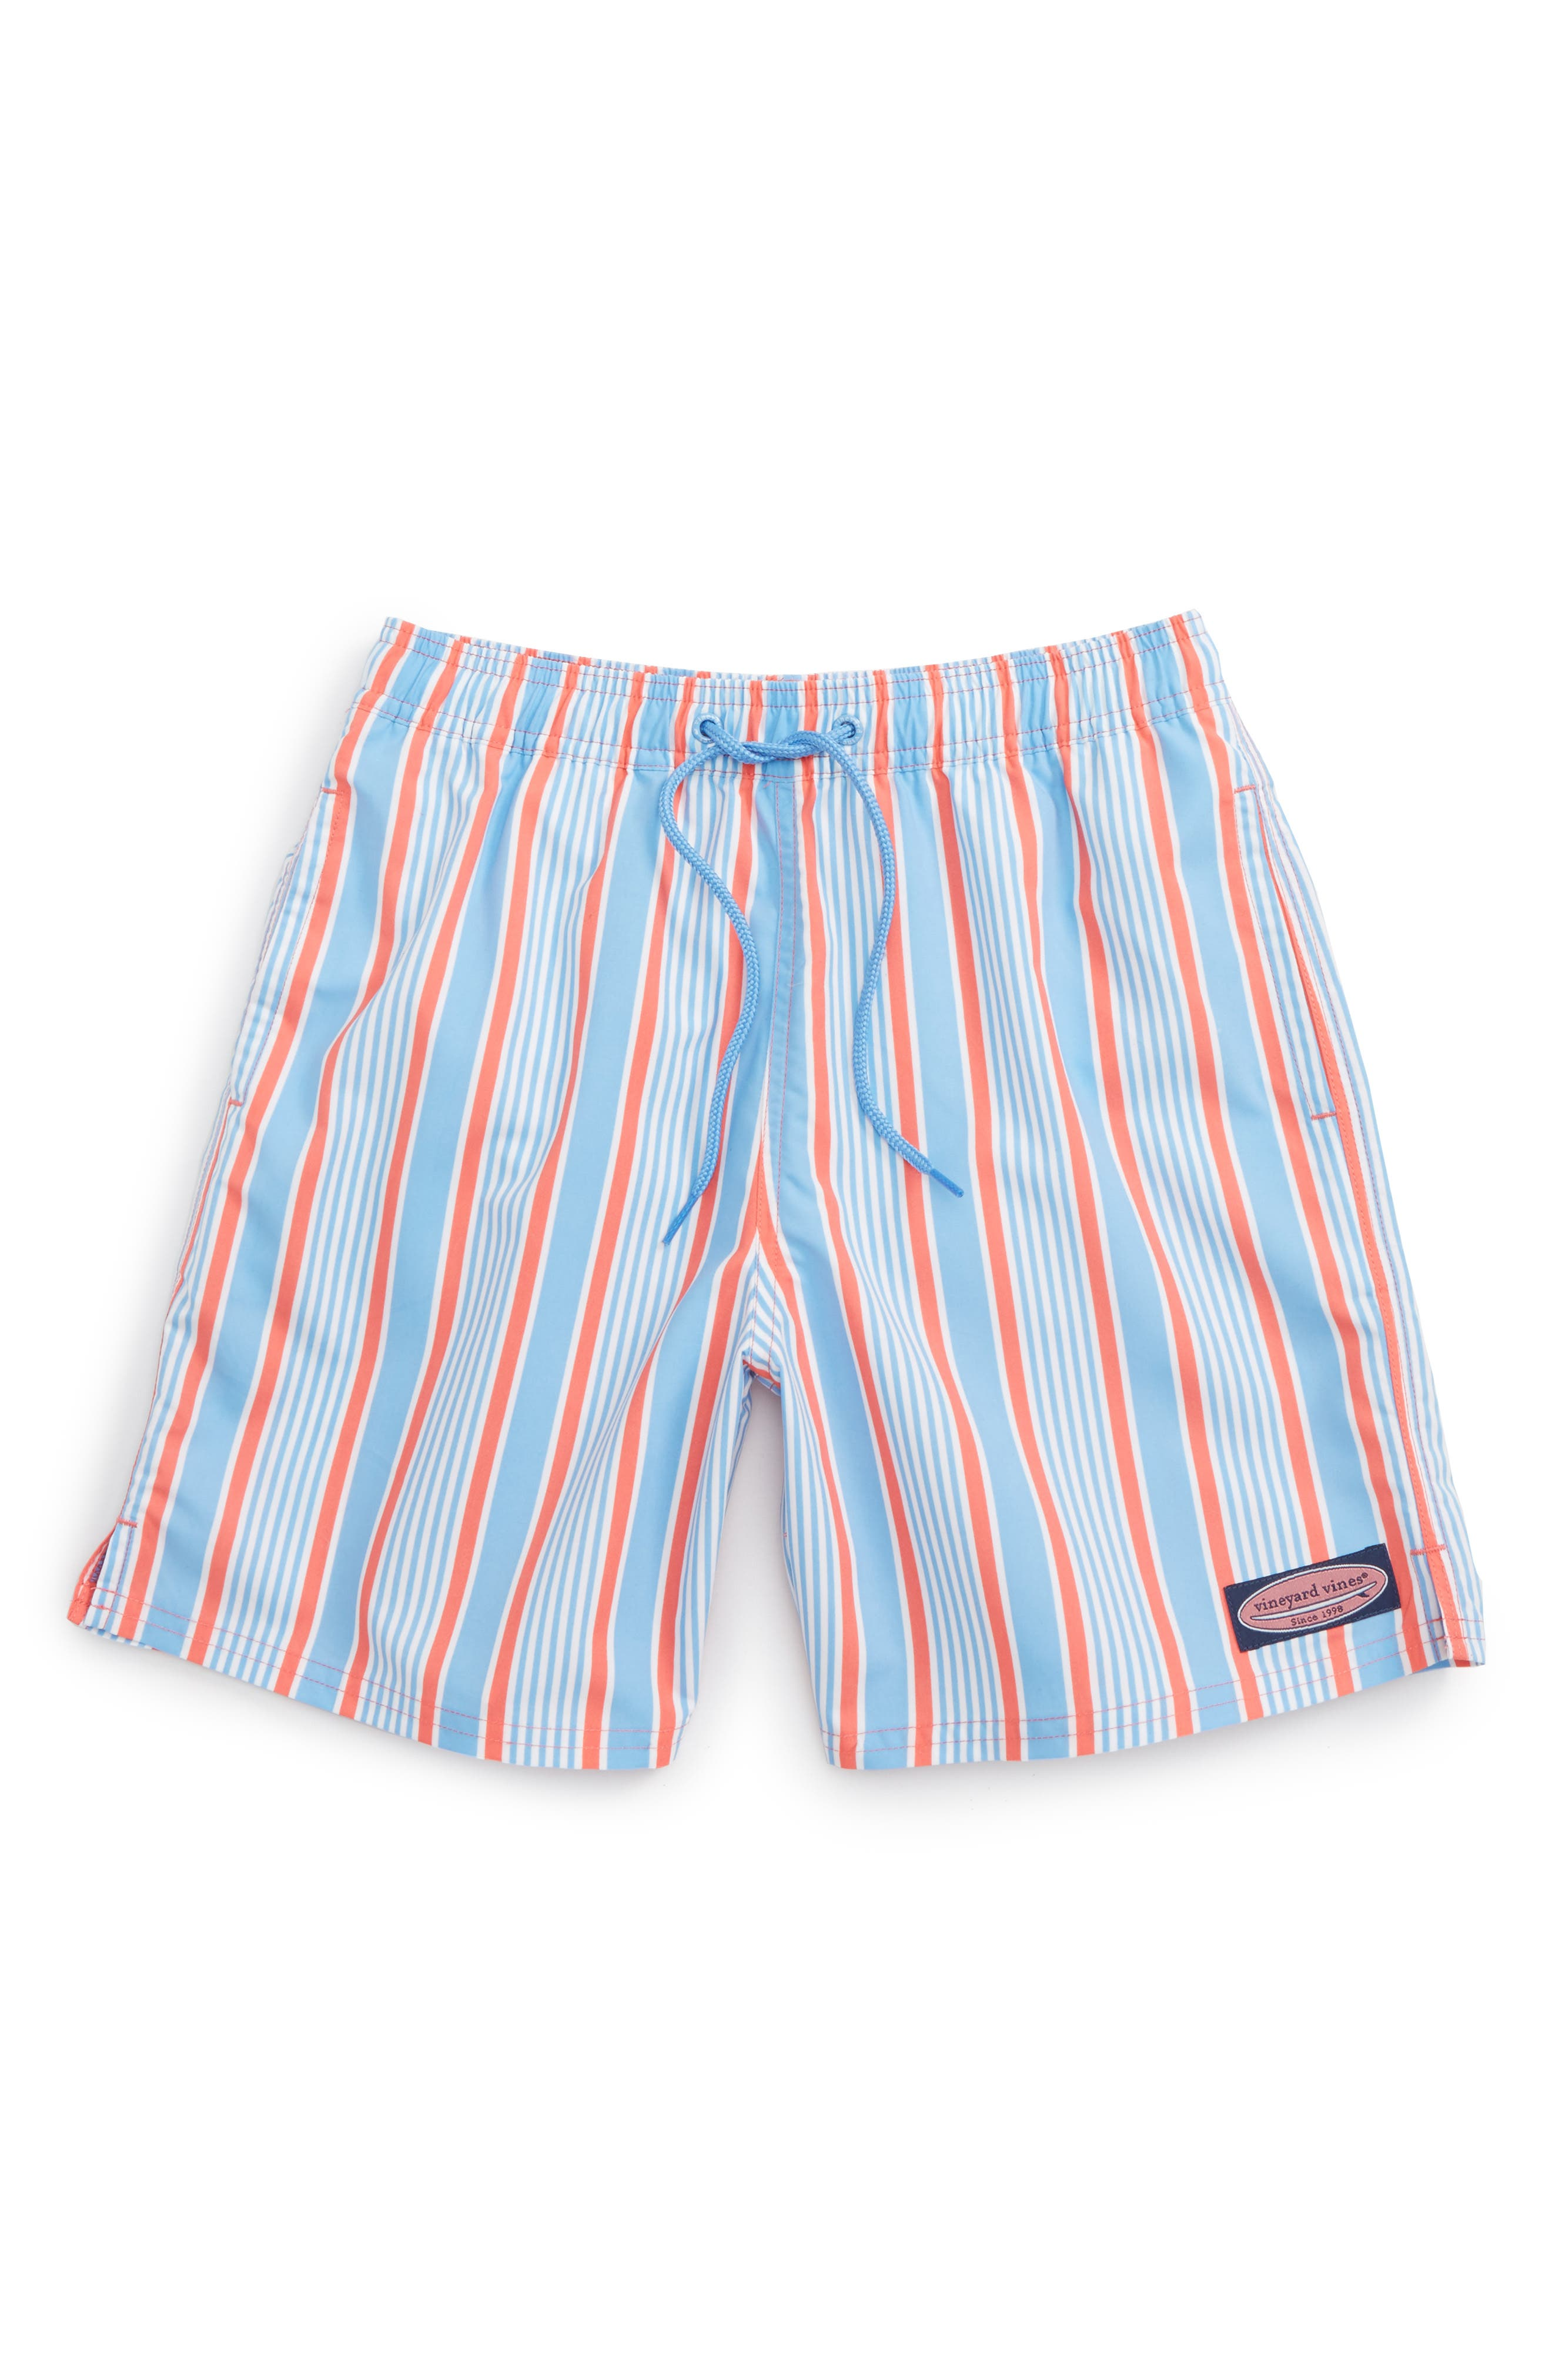 Stripe Bungalow Swim Trunks,                         Main,                         color, Mai Tai